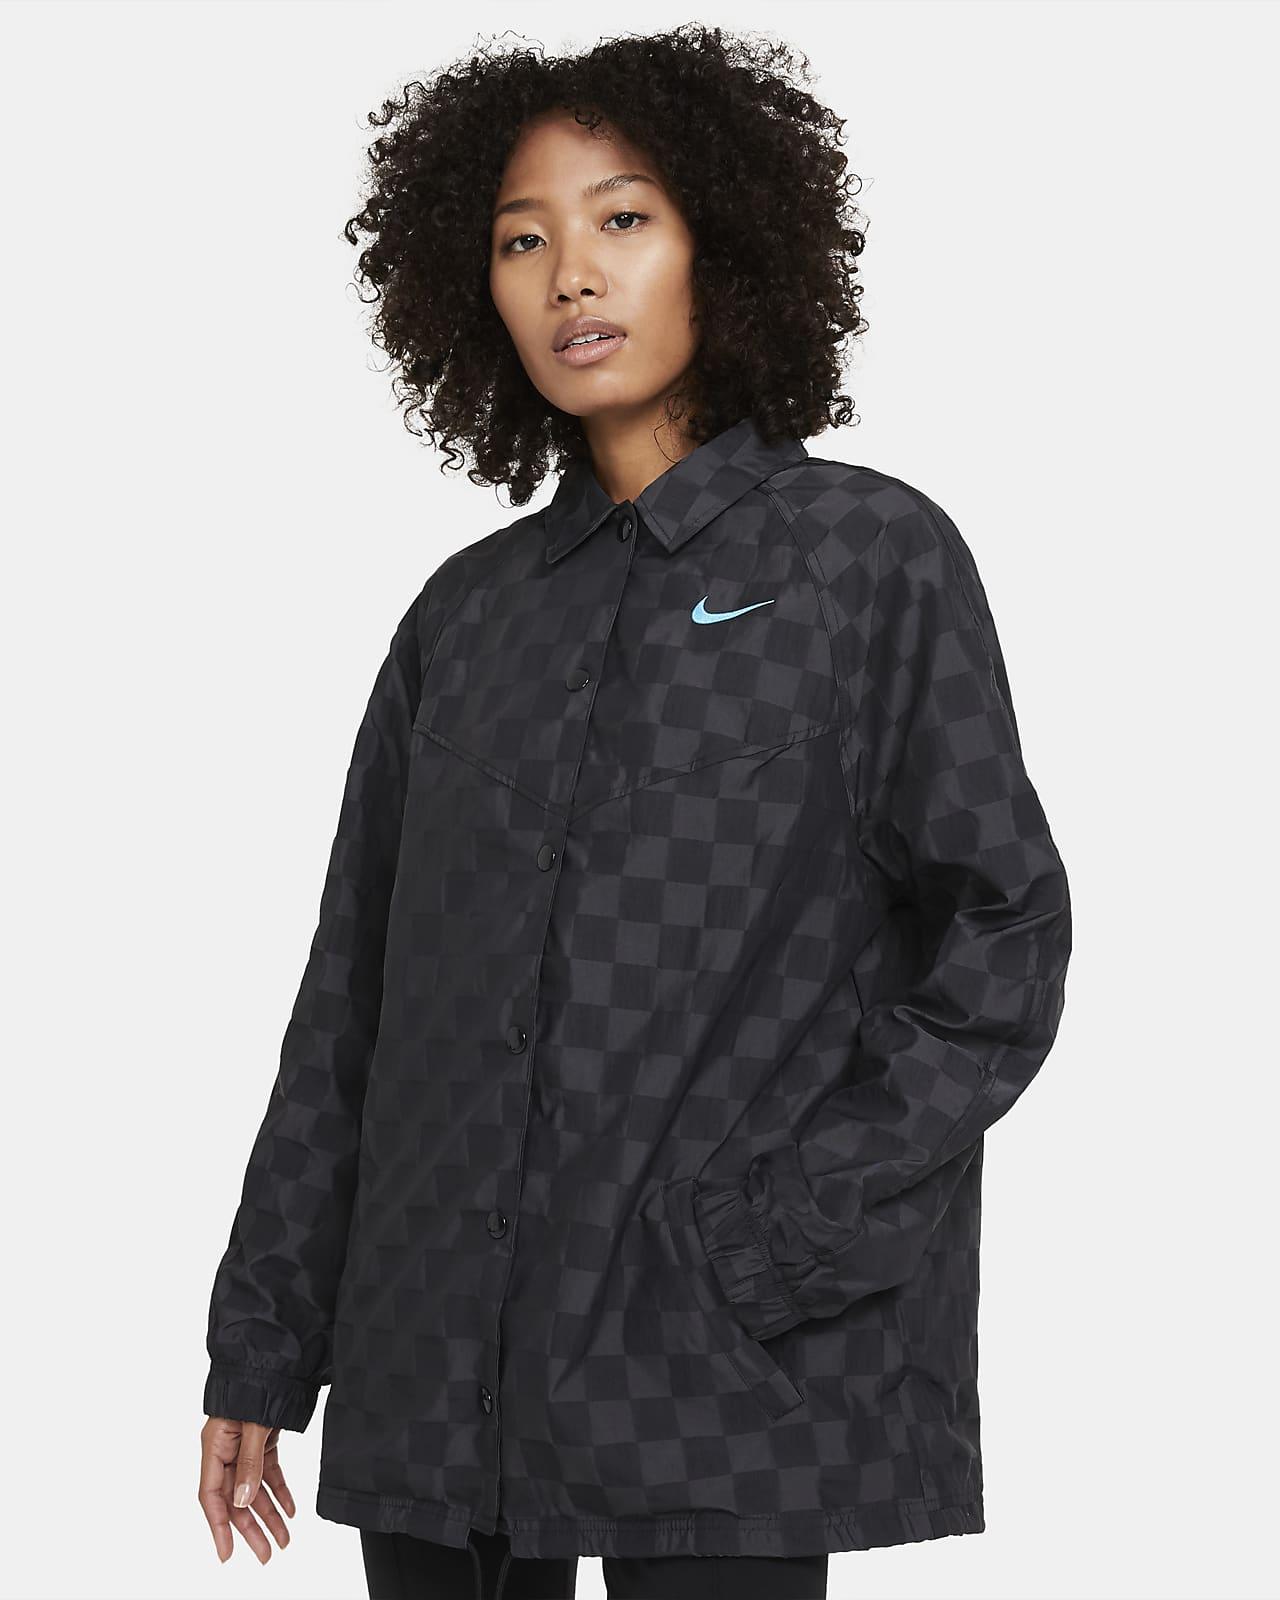 Nike Sportswear Icon Clash Women's Coaches' Jacket